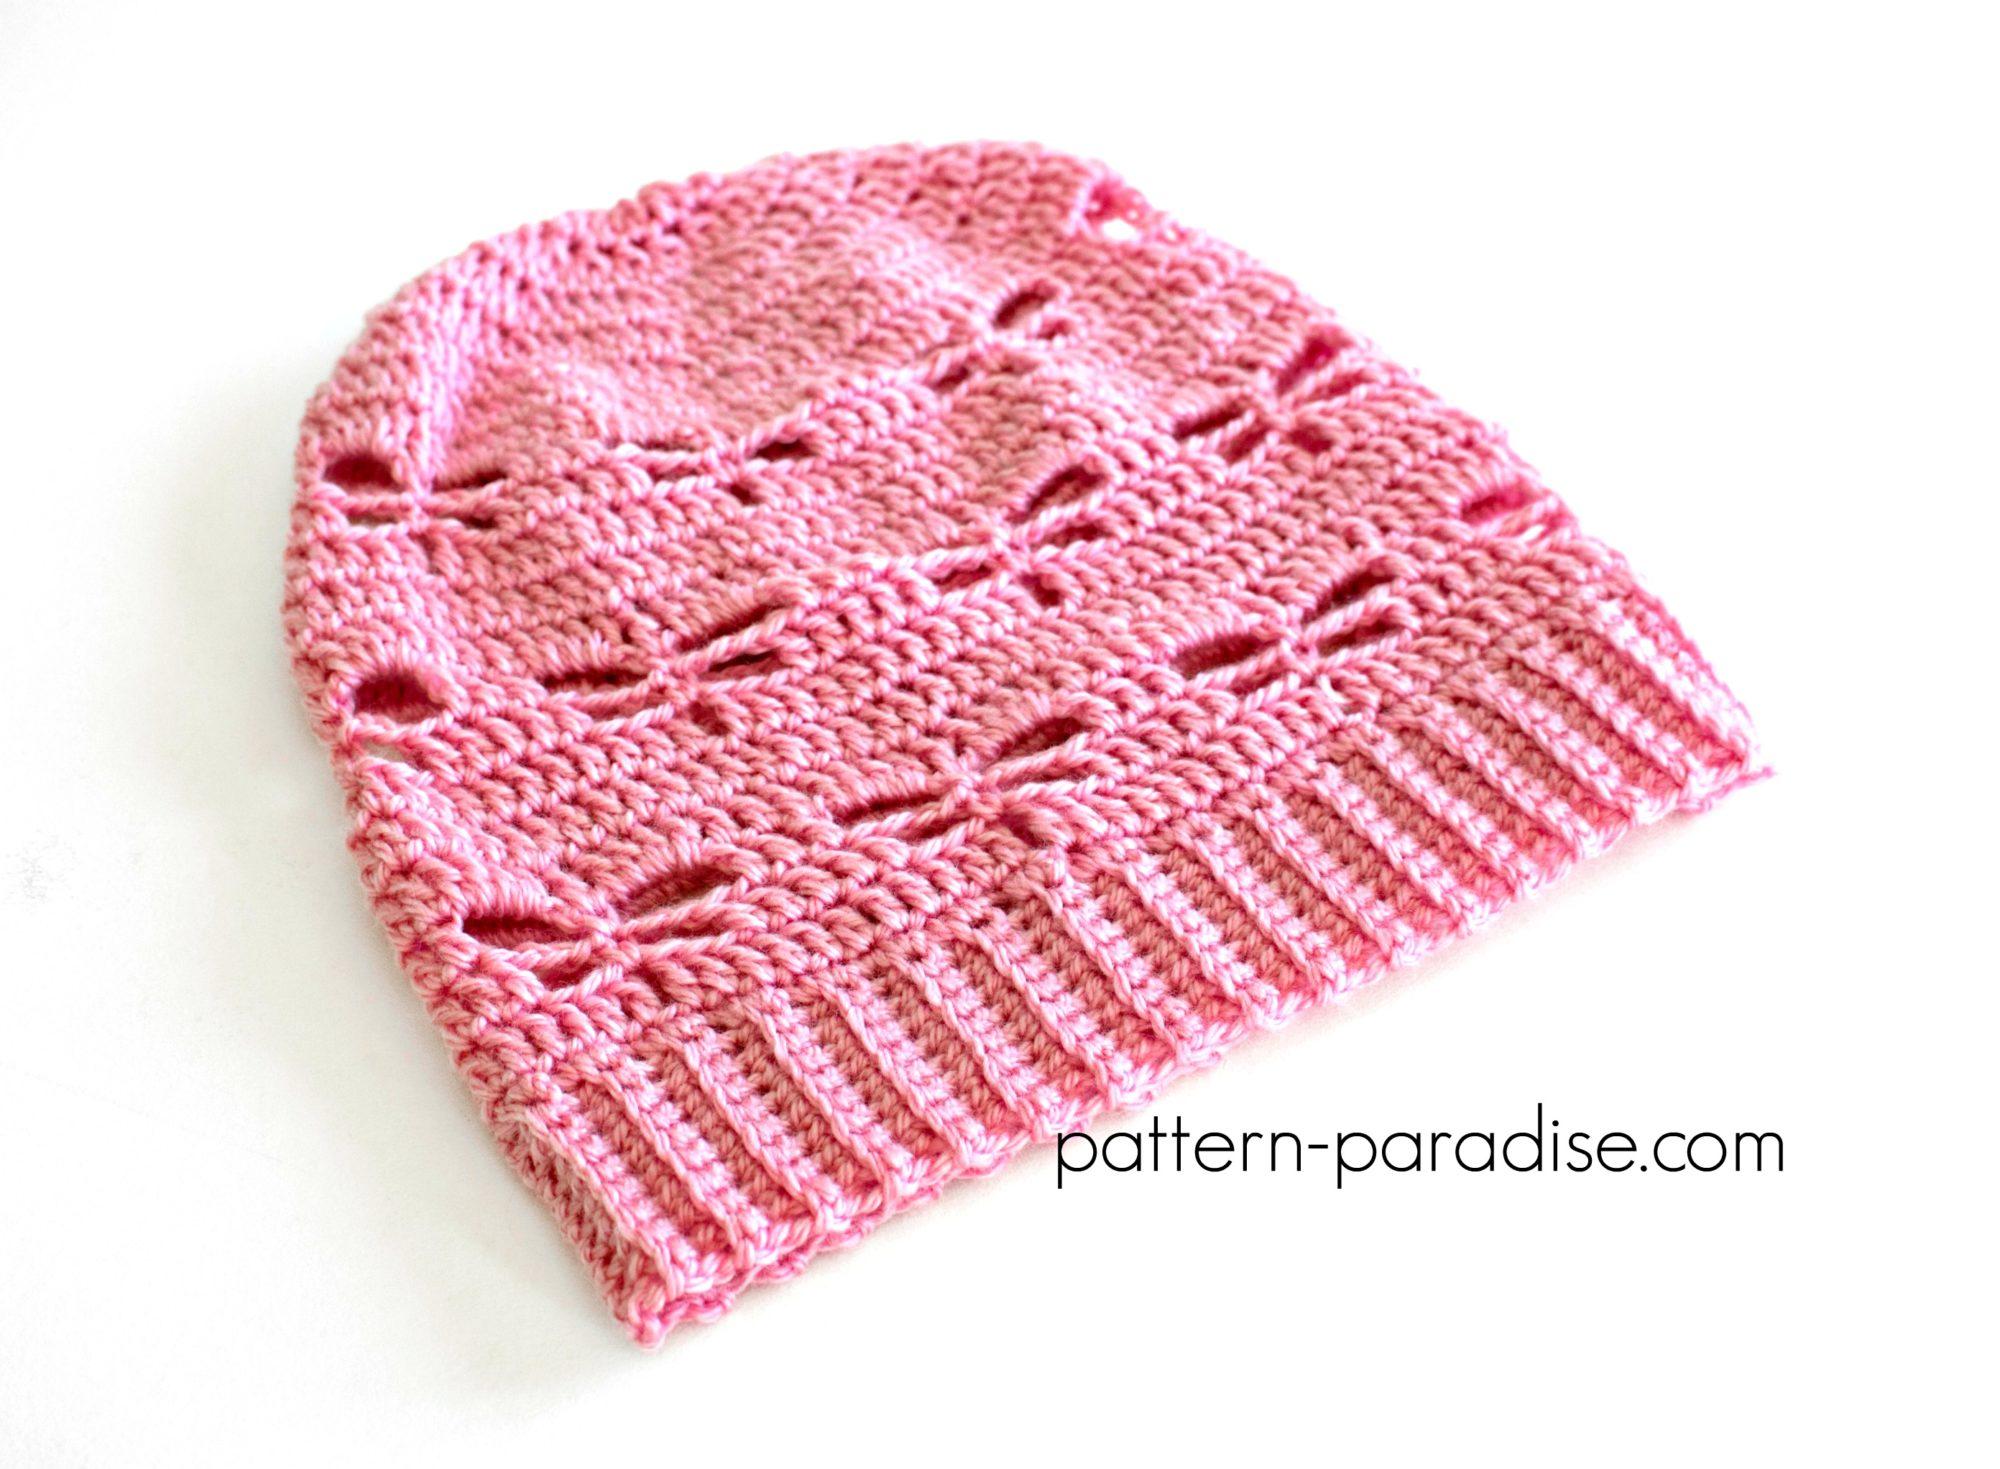 Free Crochet Pattern Dragonfly Slouchy Hat Pattern Paradise